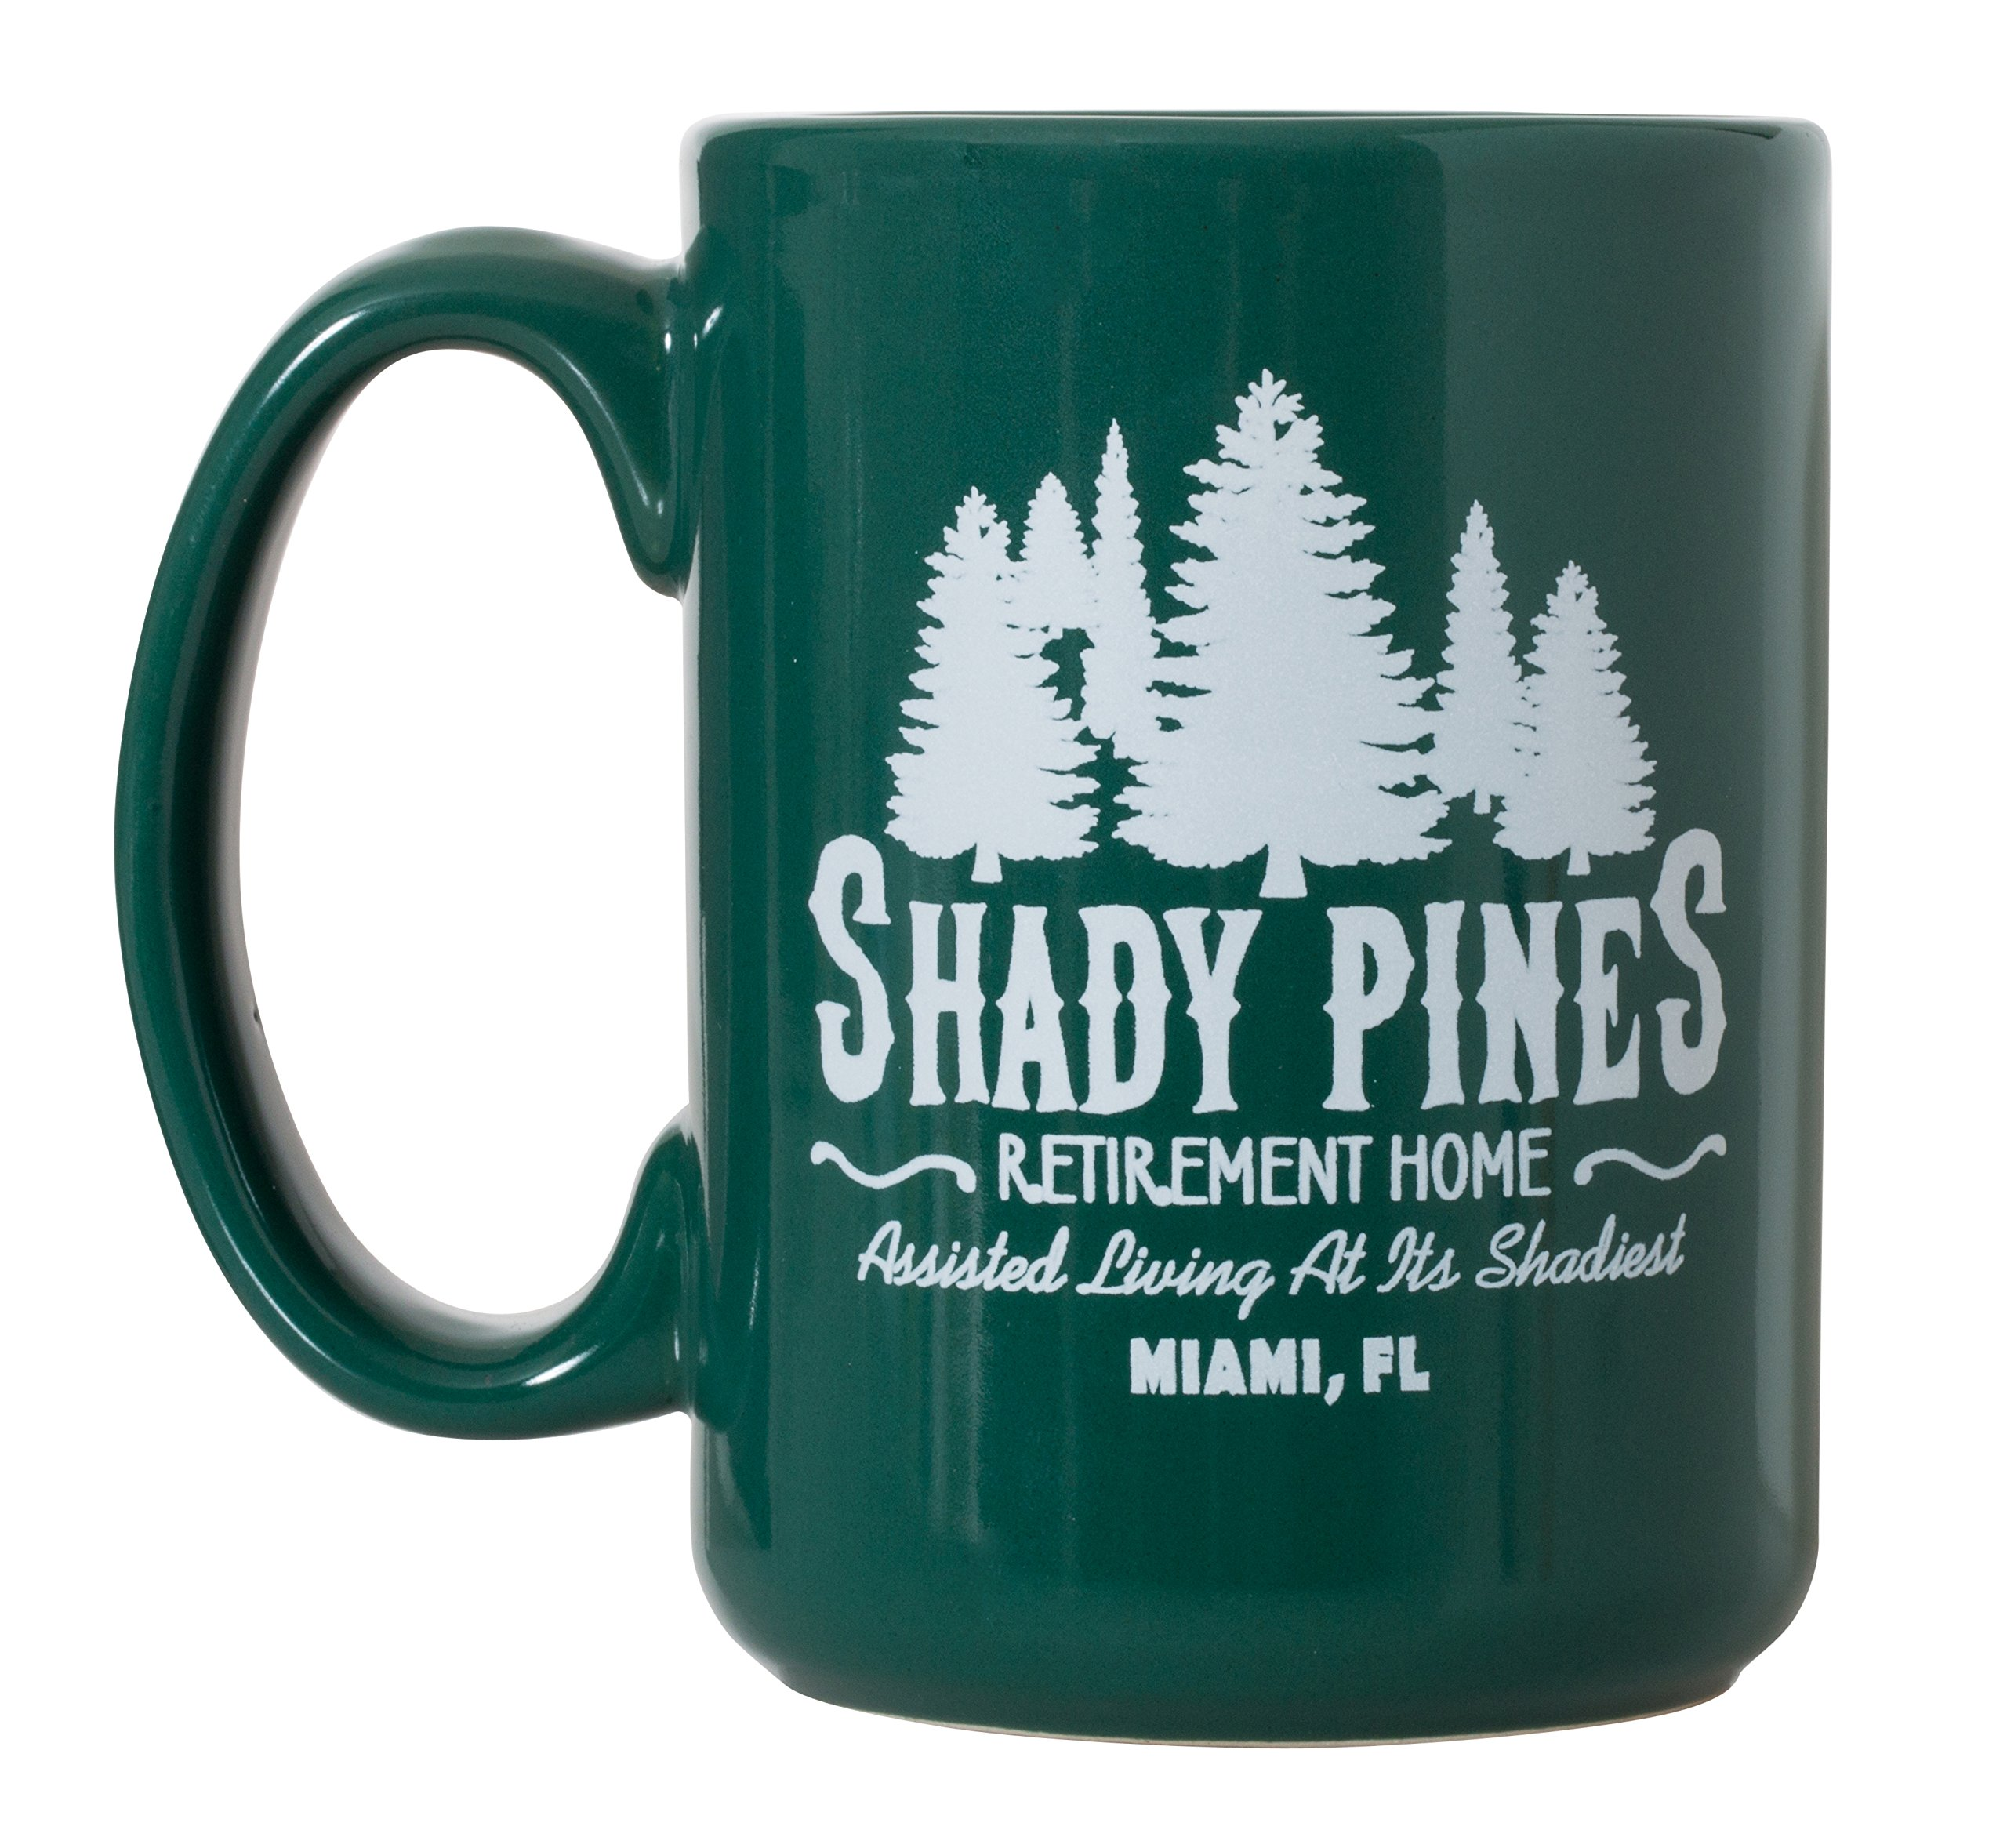 Shady Pines Retirement Home Mug Golden Girls Inspired - 15oz Deluxe Double-Sided Coffee Tea Mug (Green)